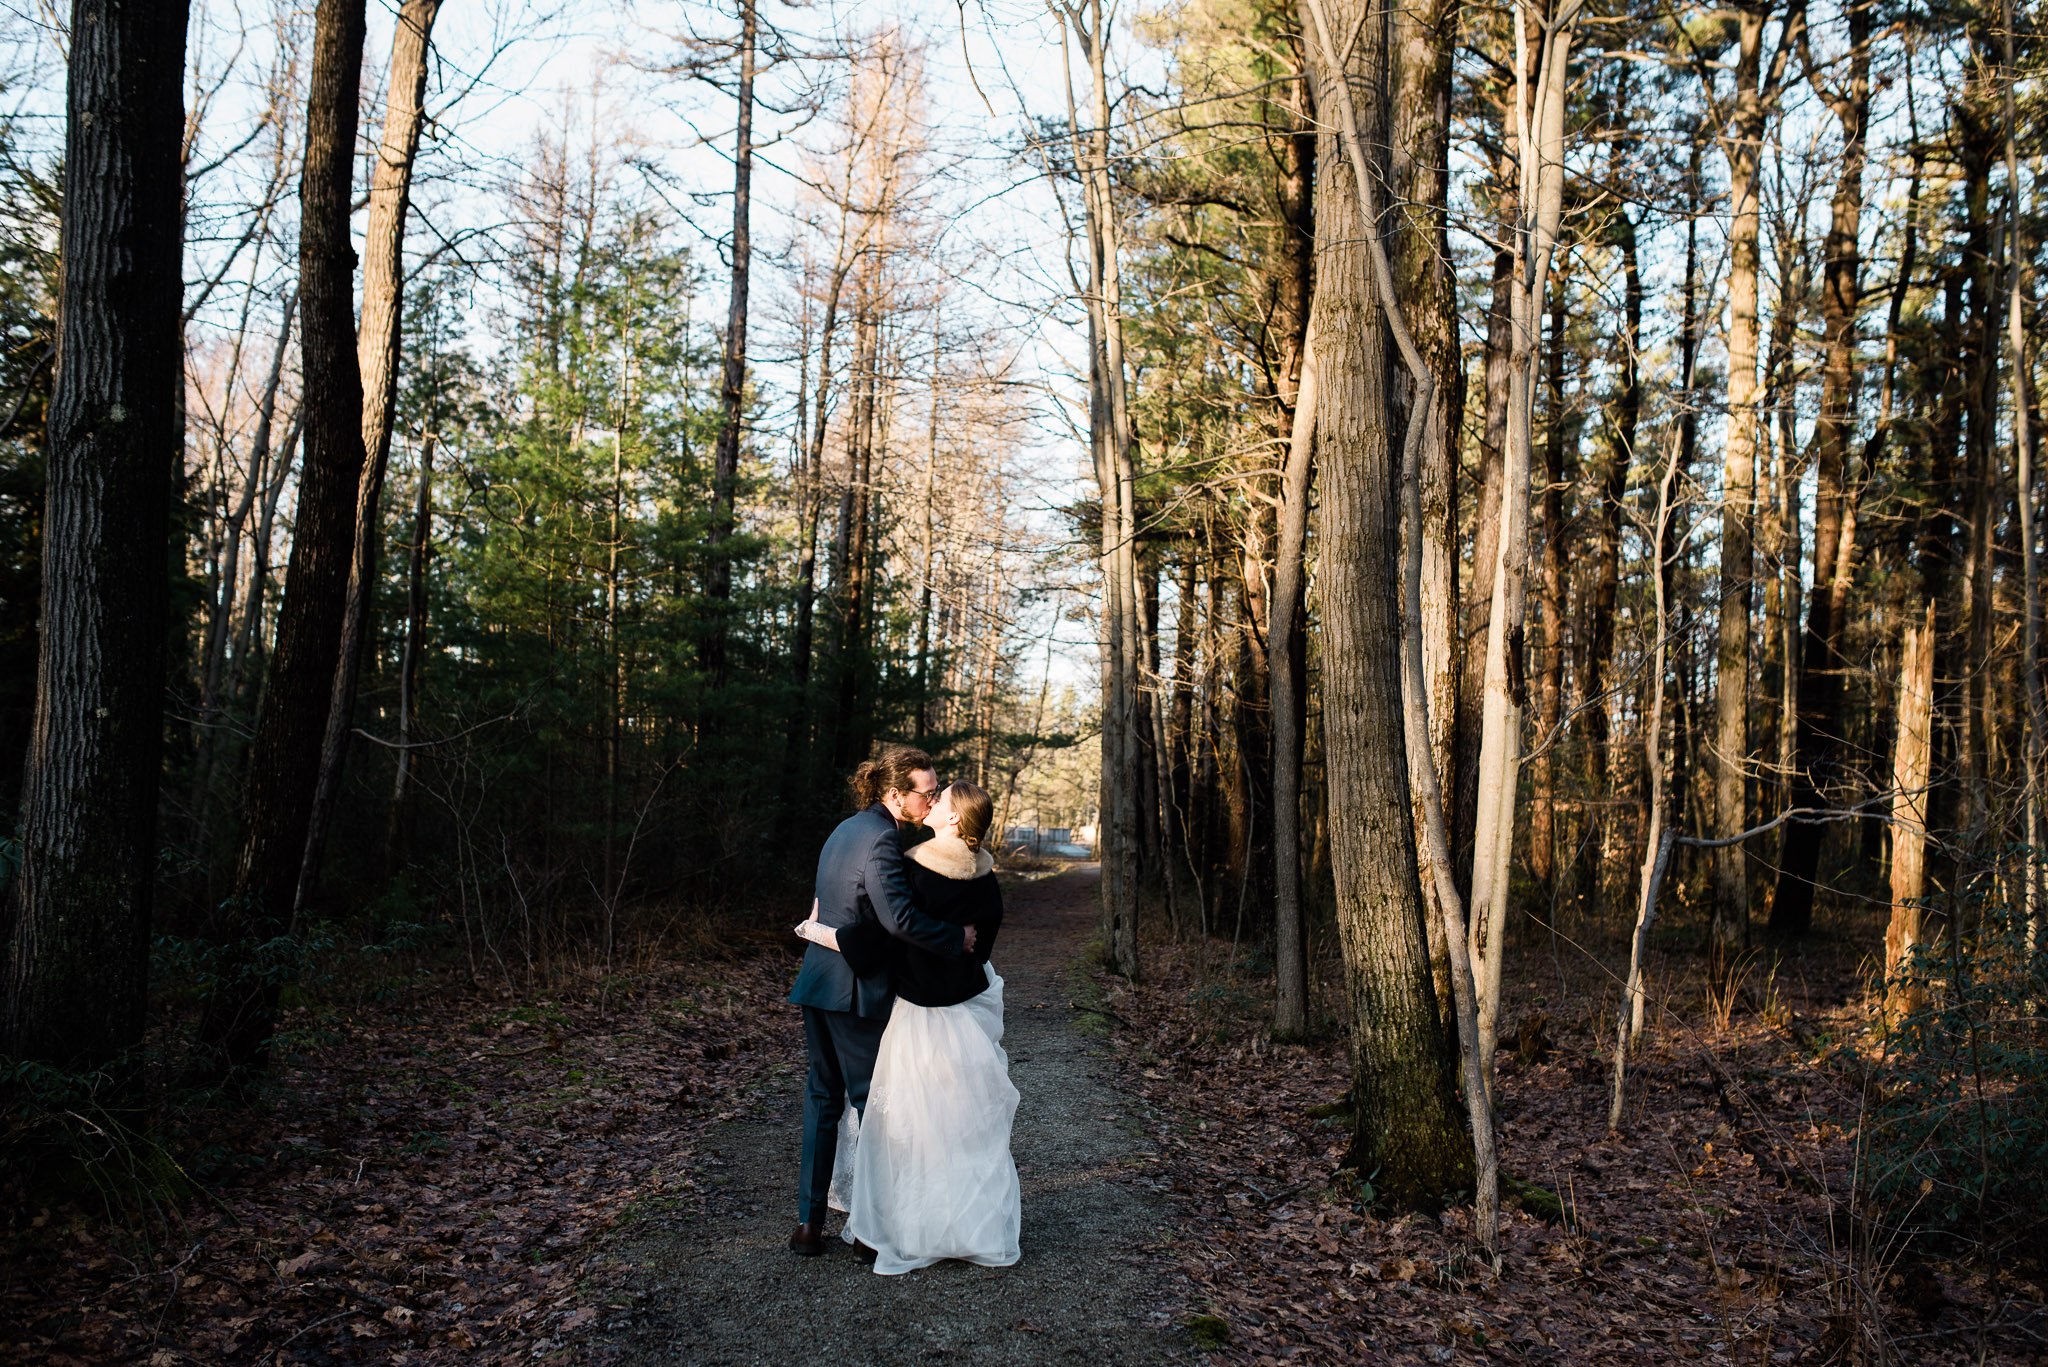 Wedding Couples portrait, Ligonier Wedding Photographer, Ligonier PA wedding, wedding potraits-6848.jpg